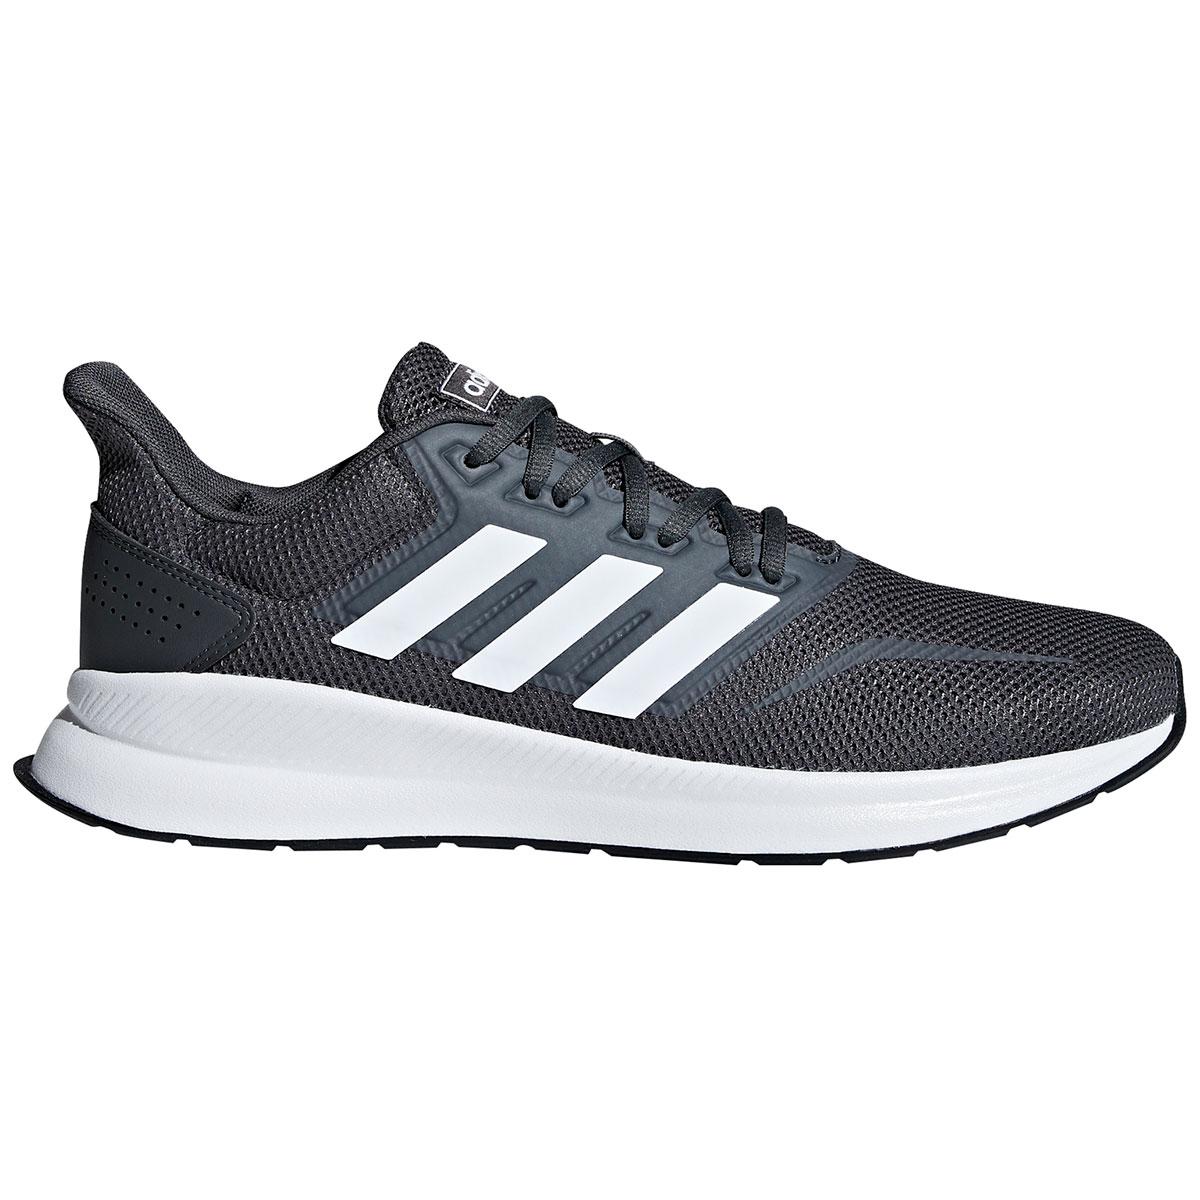 Adidas Men's Run Falcon Running Shoes - Black, 11